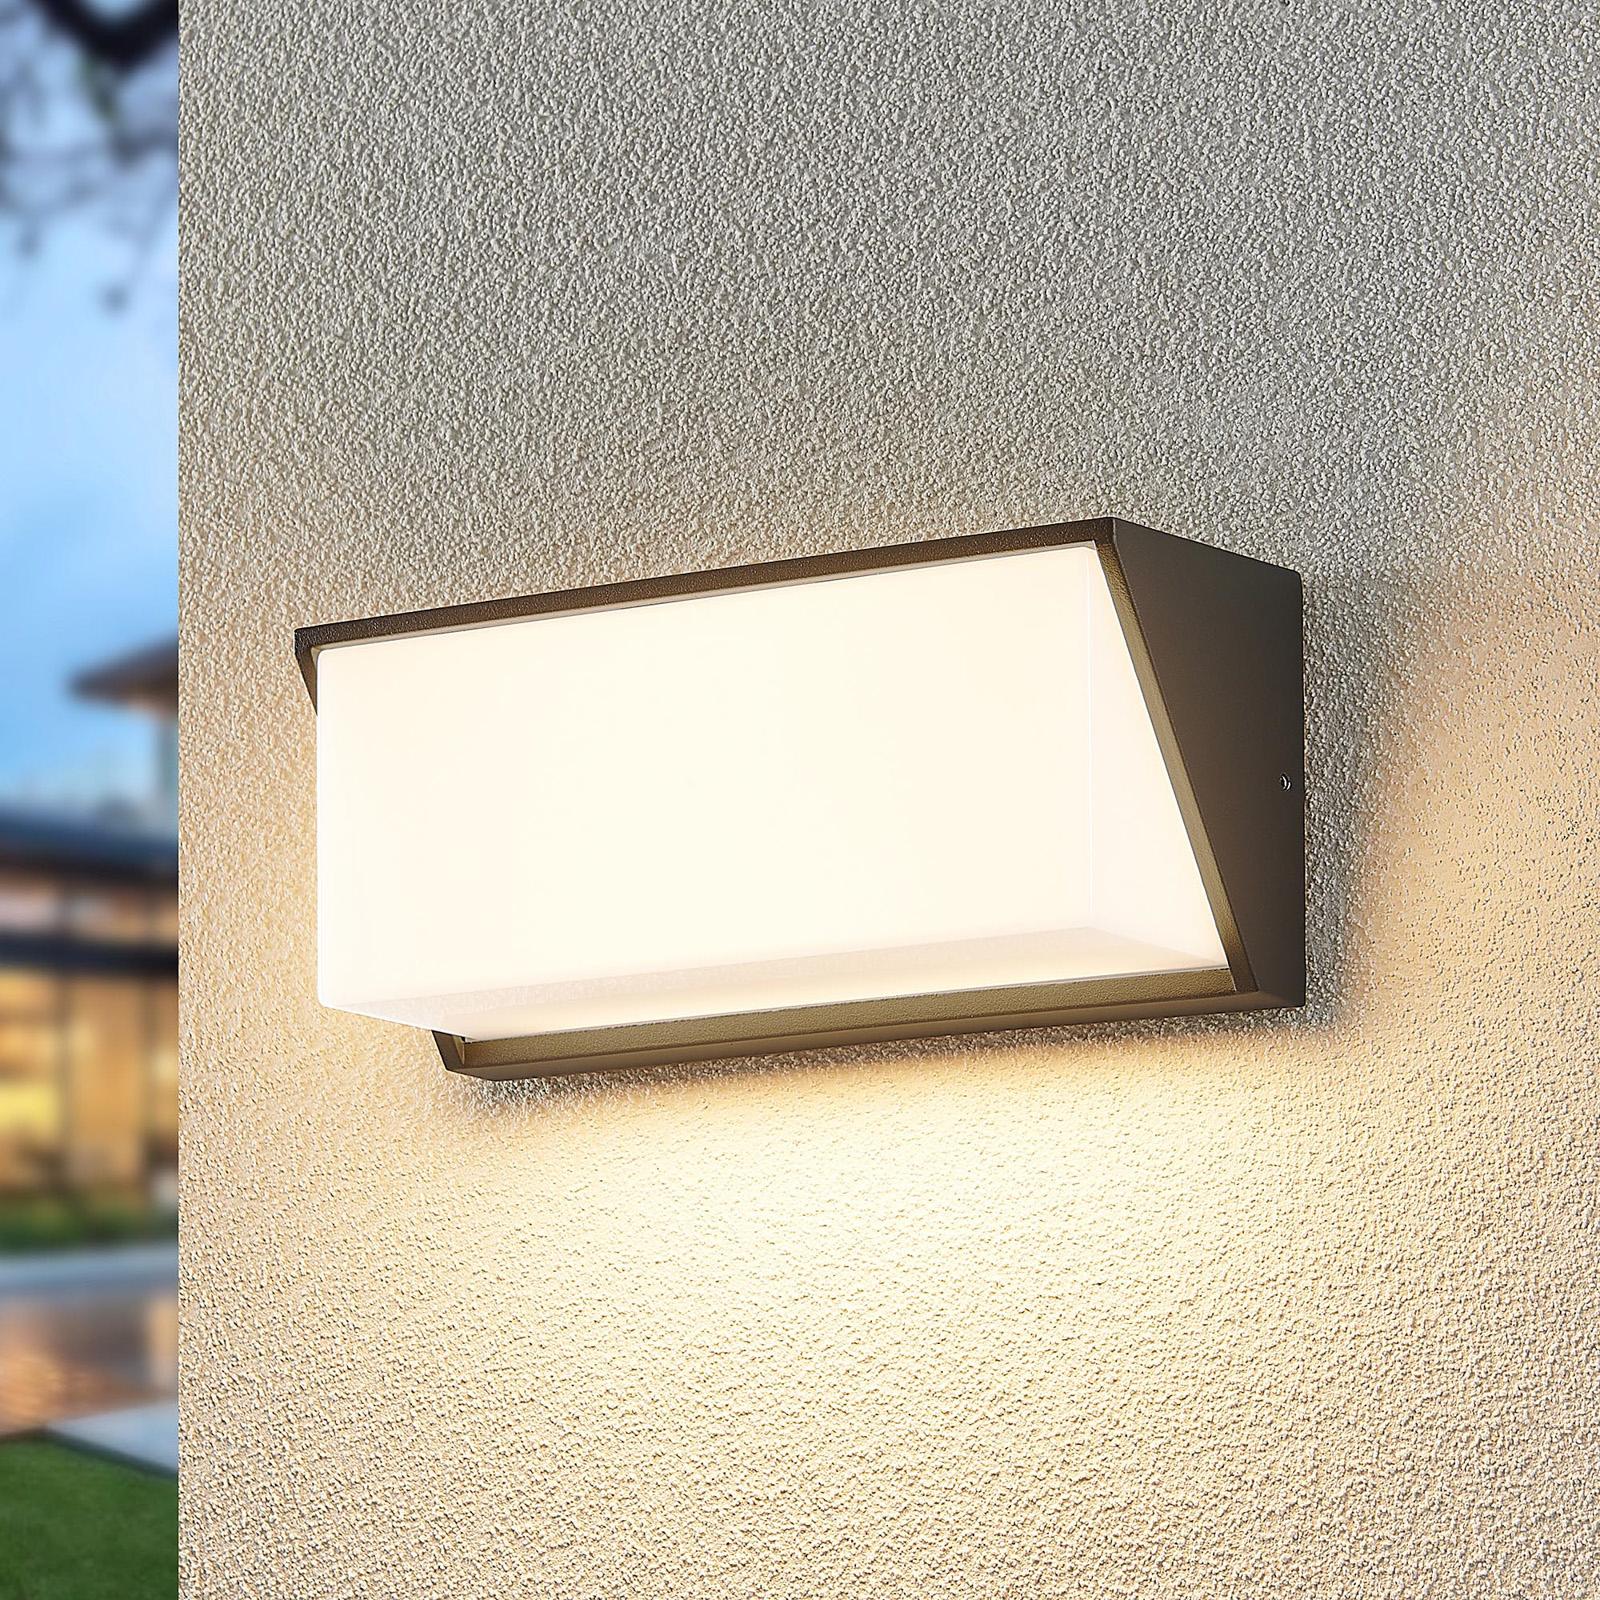 Lindby Malim LED-vegglampe til uteområdet